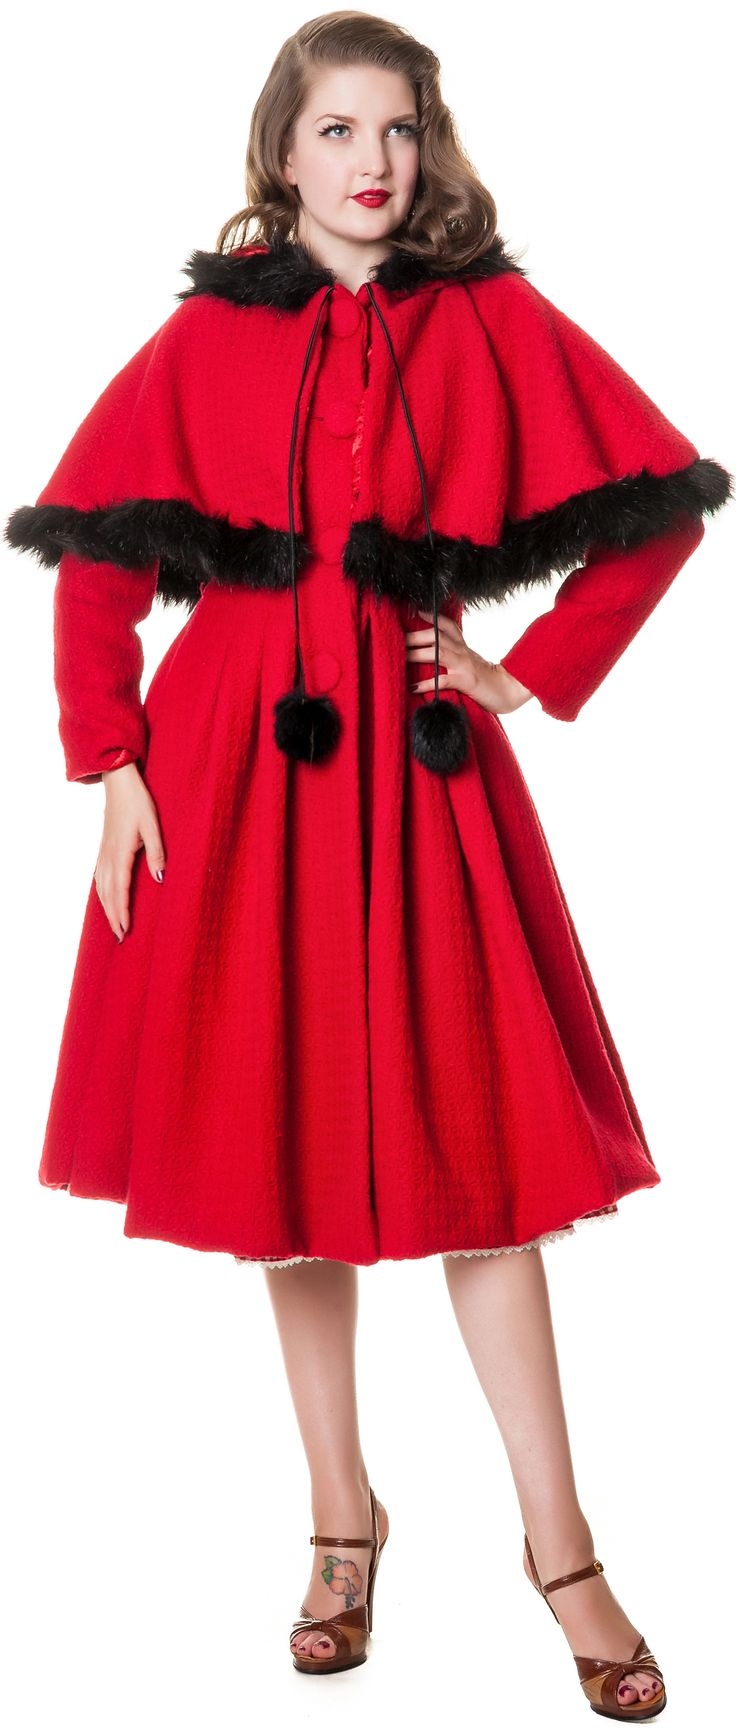 51 best Adorable Vintage Coats images on Pinterest | Vintage style ...